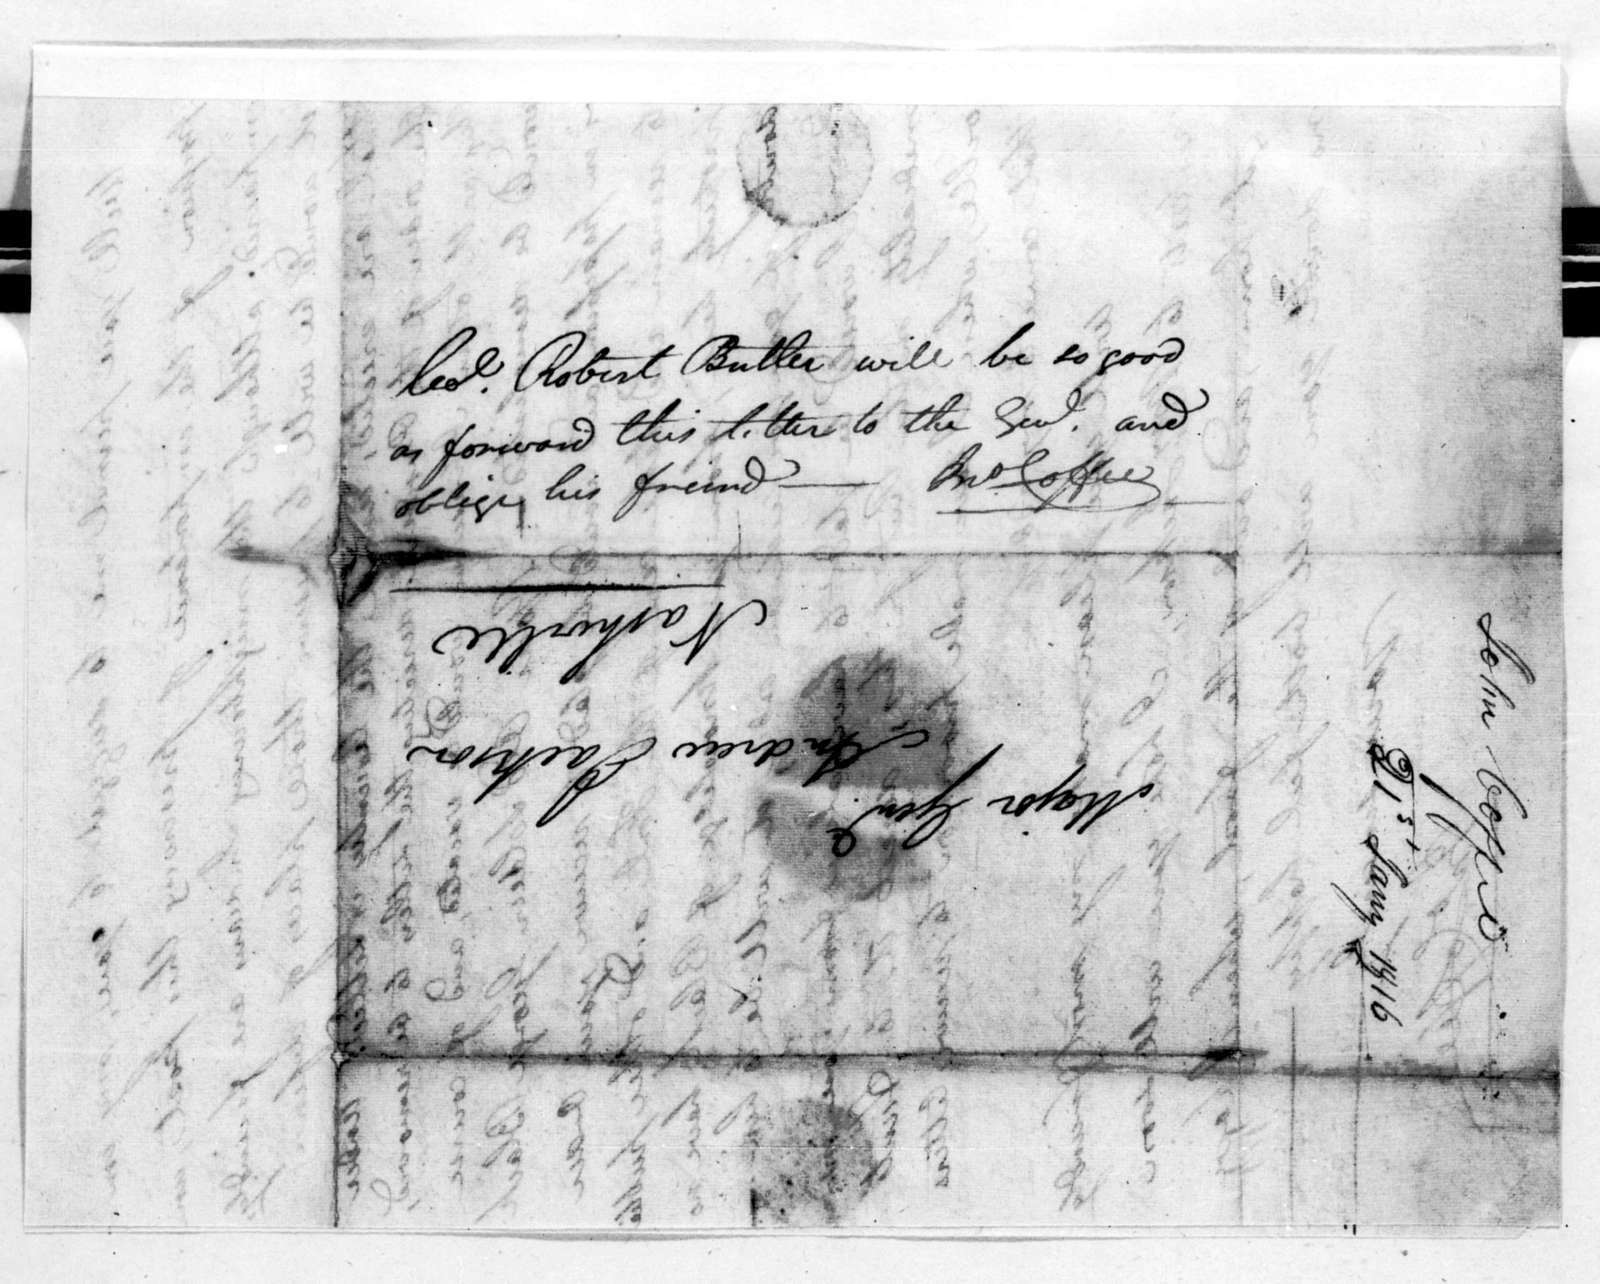 John Coffee to Andrew Jackson, January 21, 1816